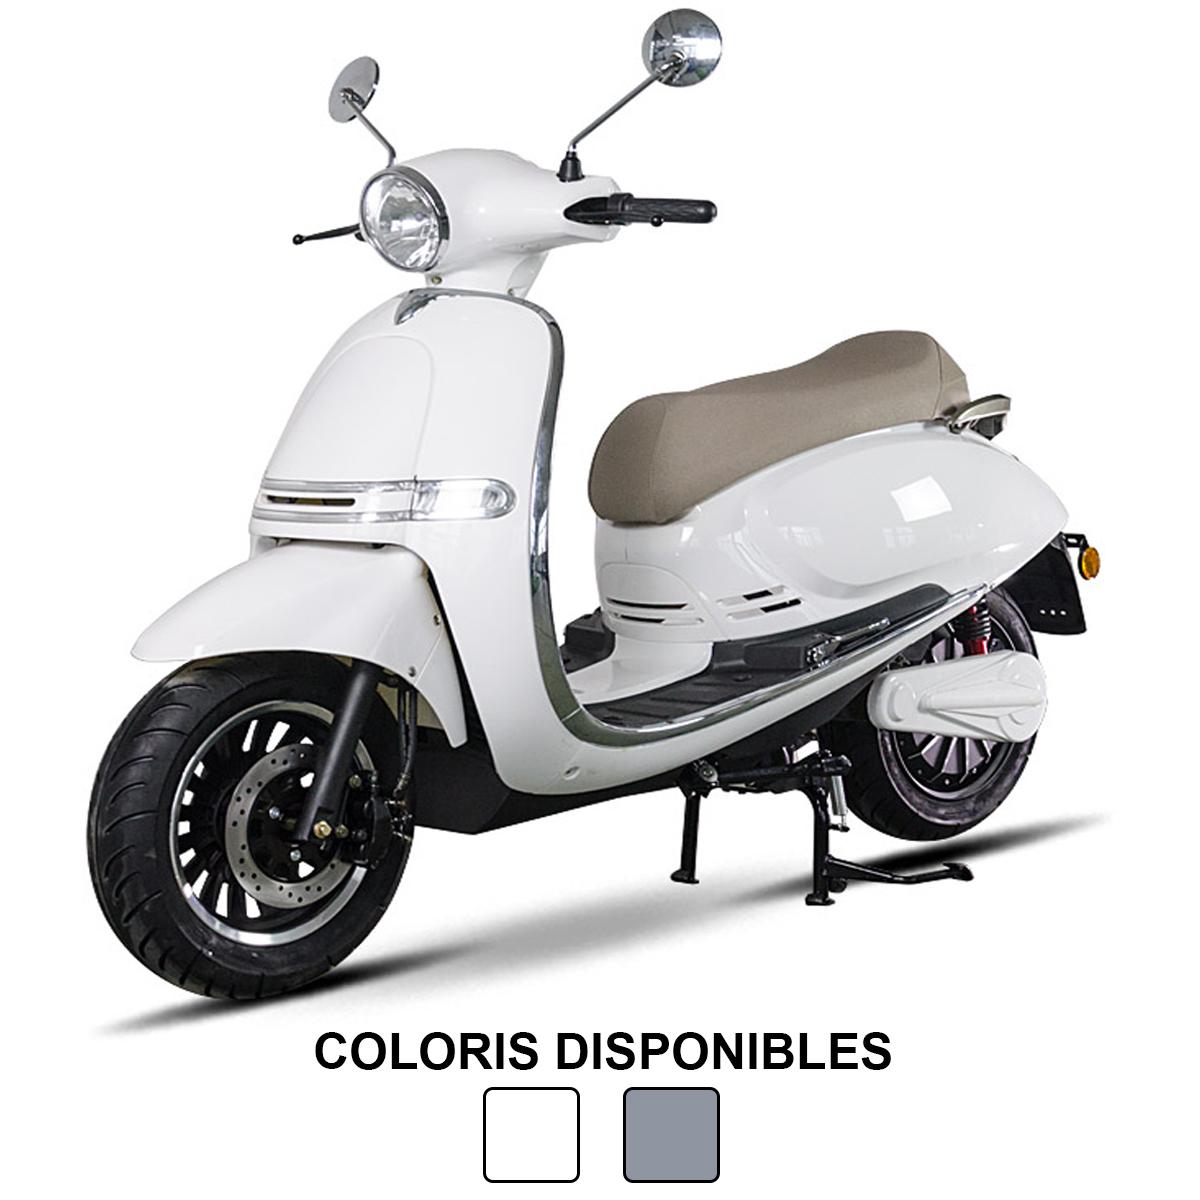 Scooter Lycke Neo75 - 125cc, vitesse 80km/h